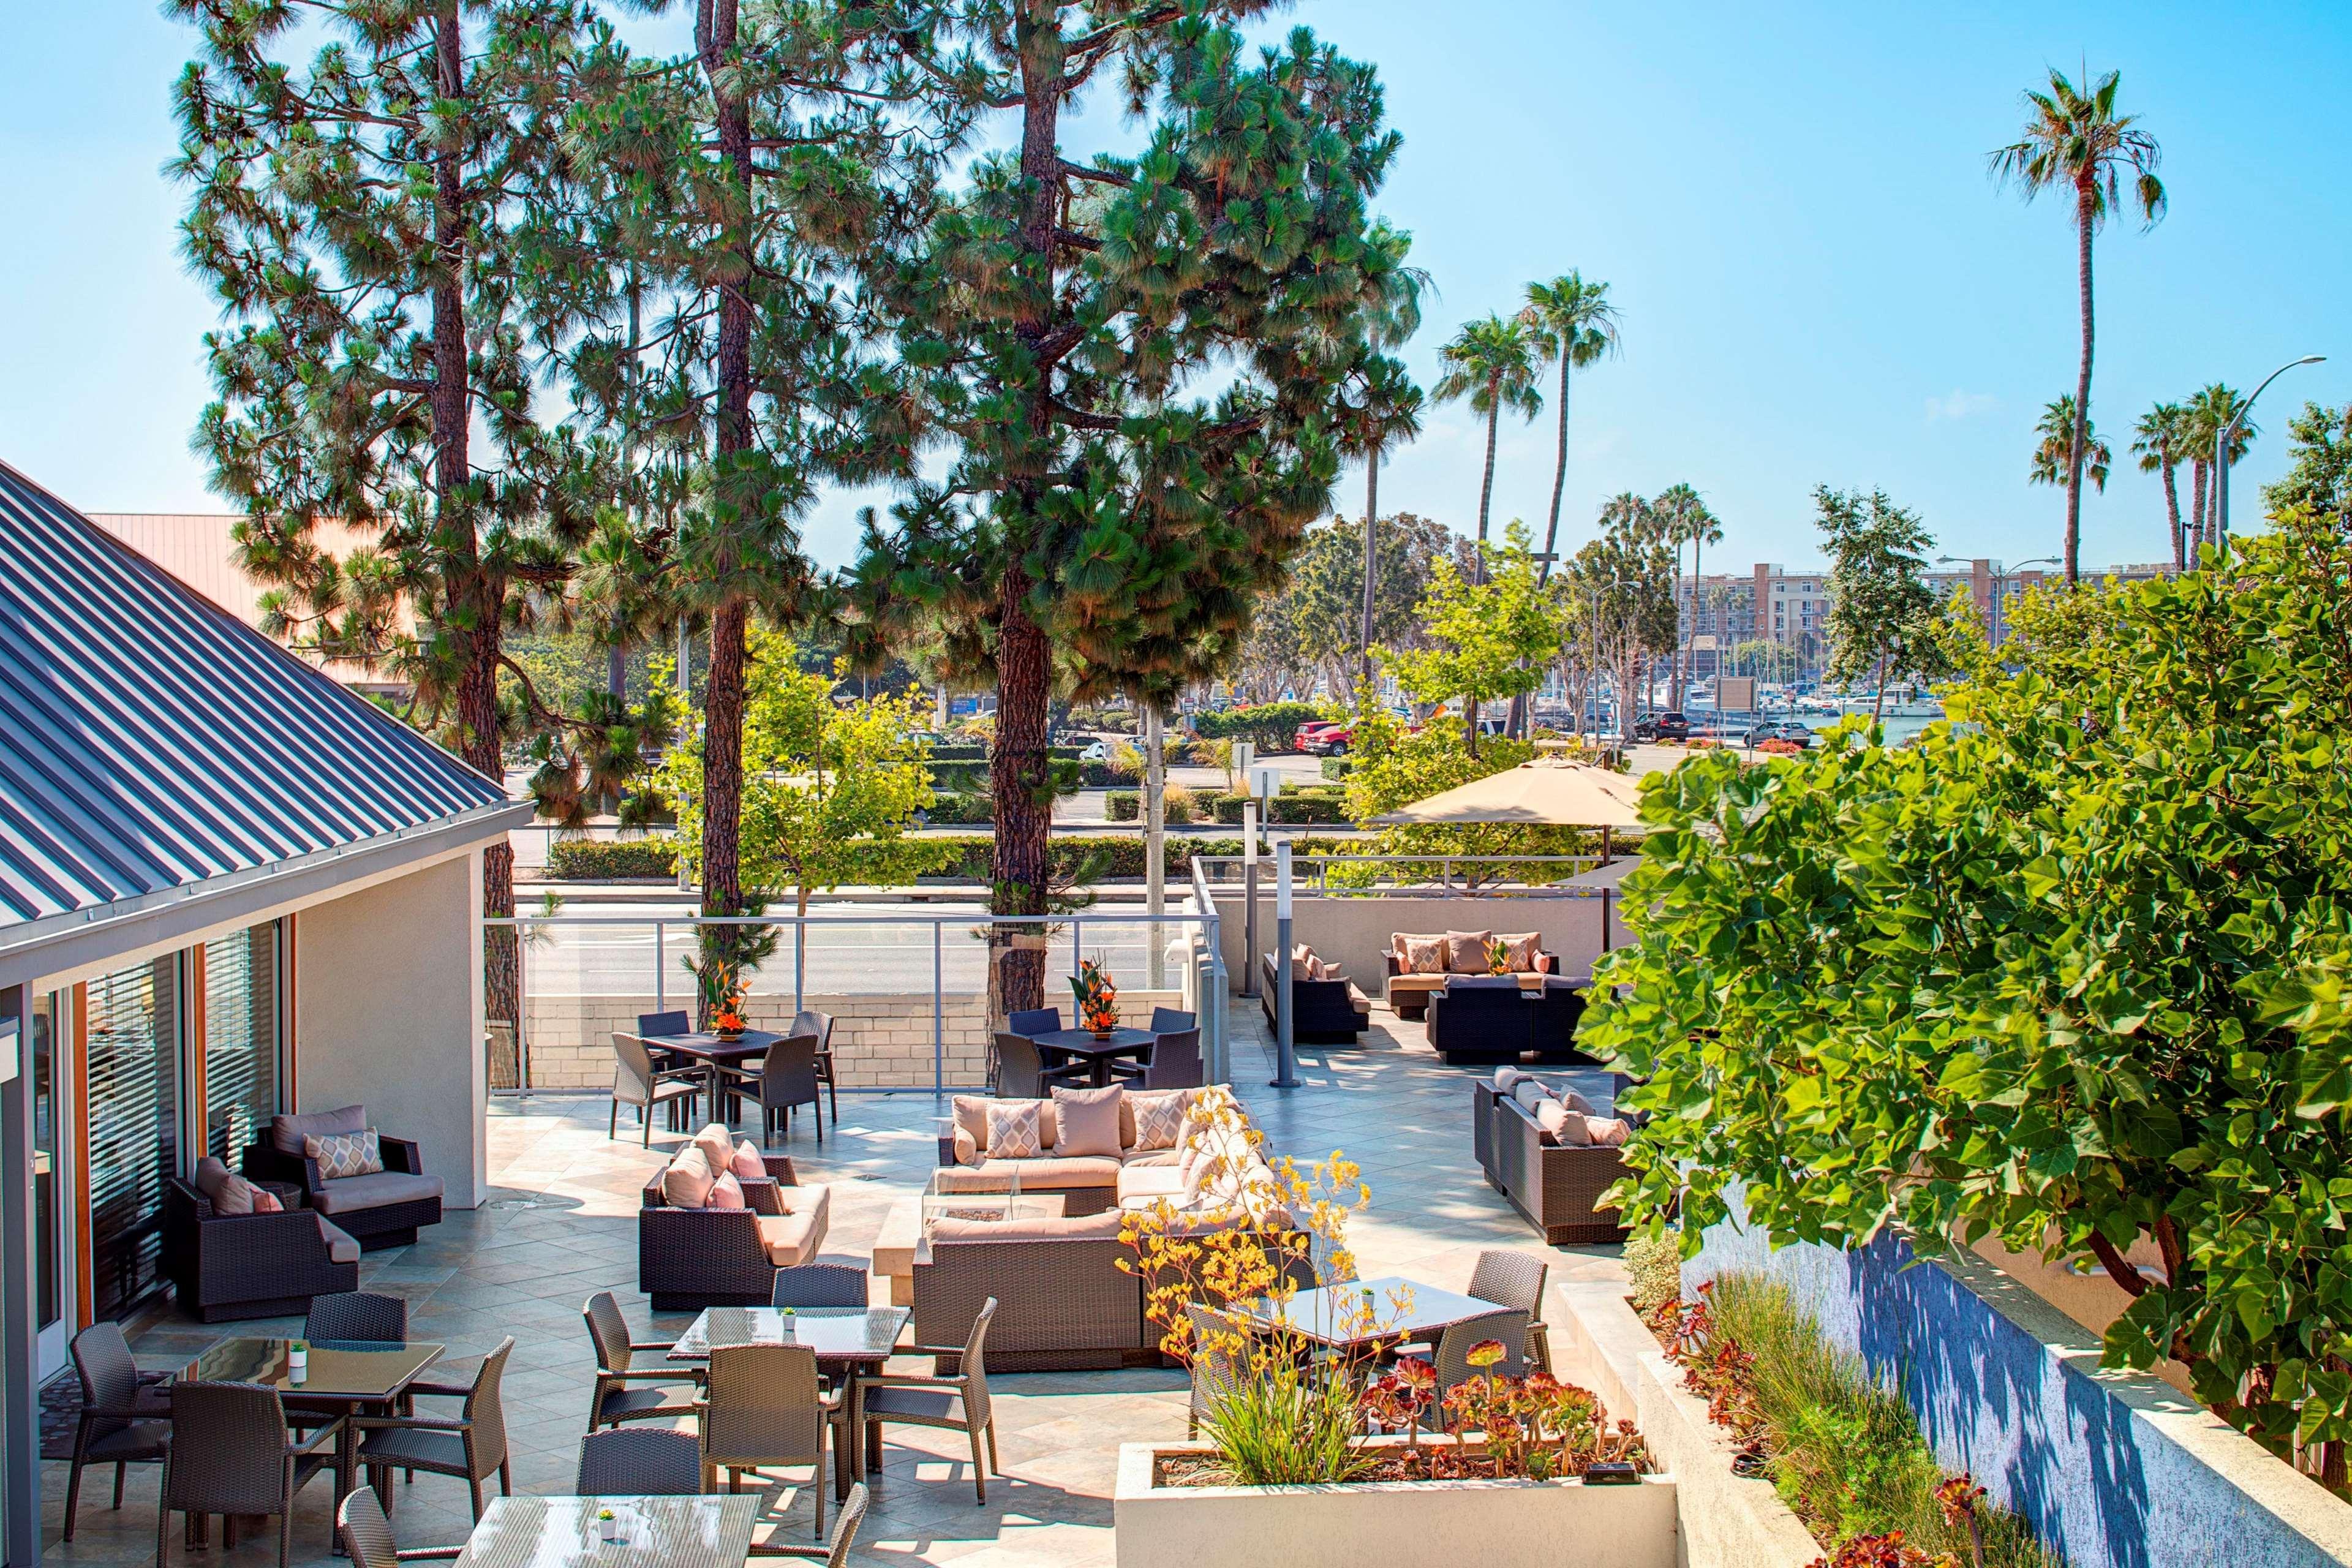 Hilton Garden Inn Los Angeles Marina Del Rey Coupons Near Me In Marina Del Rey 8coupons